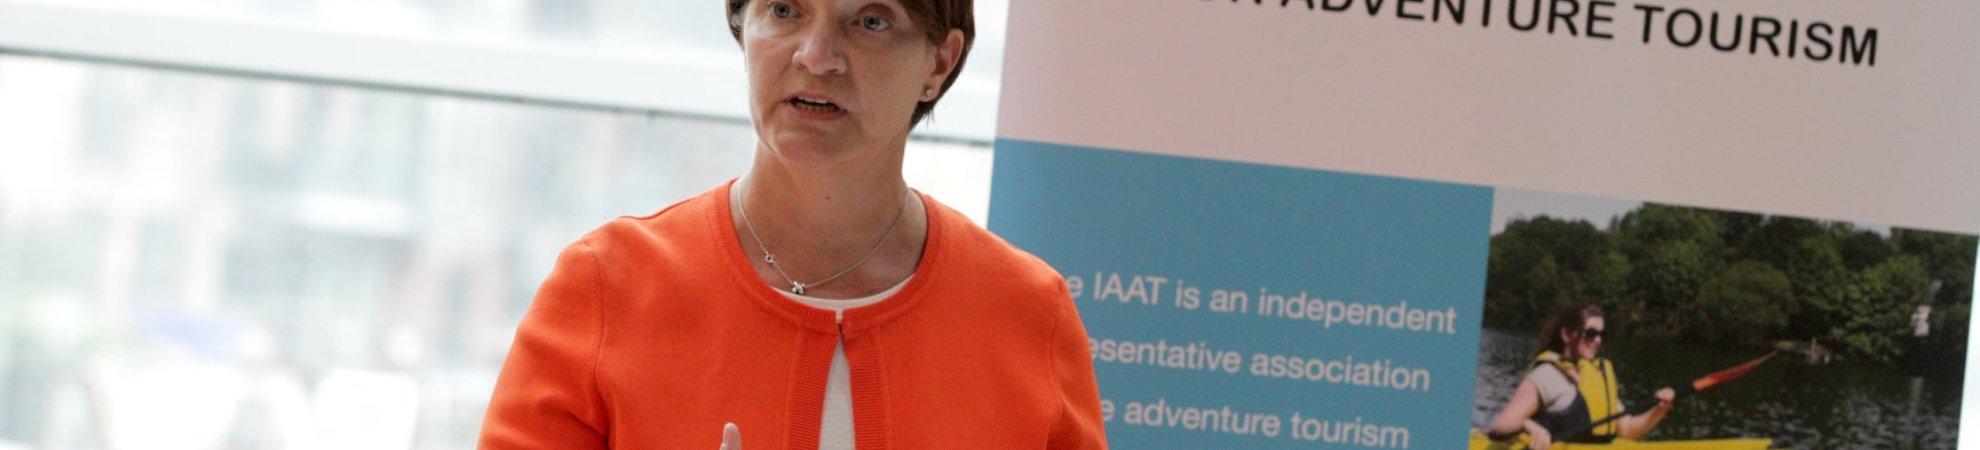 IAAT conference 2018